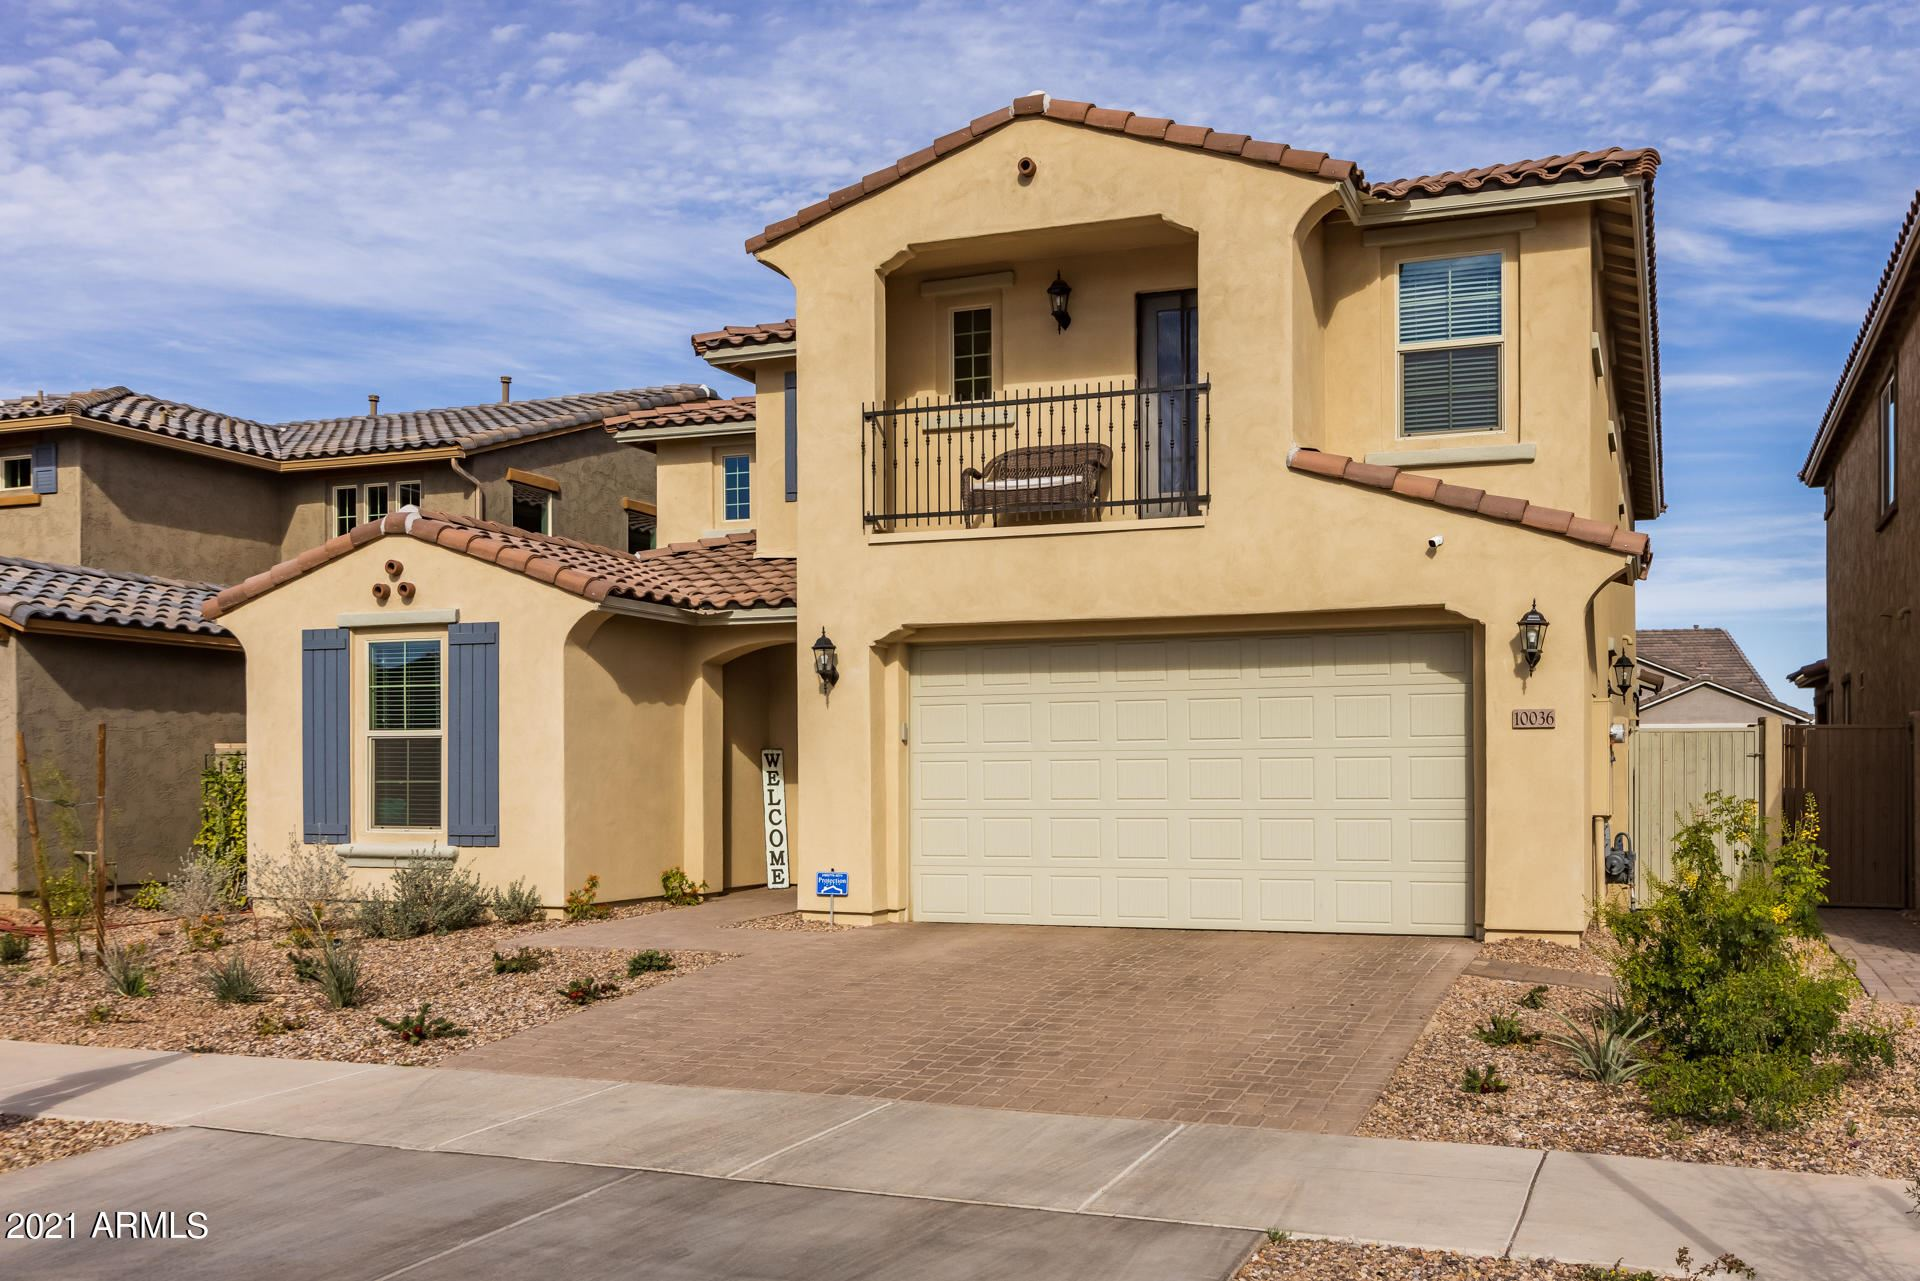 Photo of 10036 E GAMMA Avenue, Mesa, AZ 85212 (MLS # 6193847)